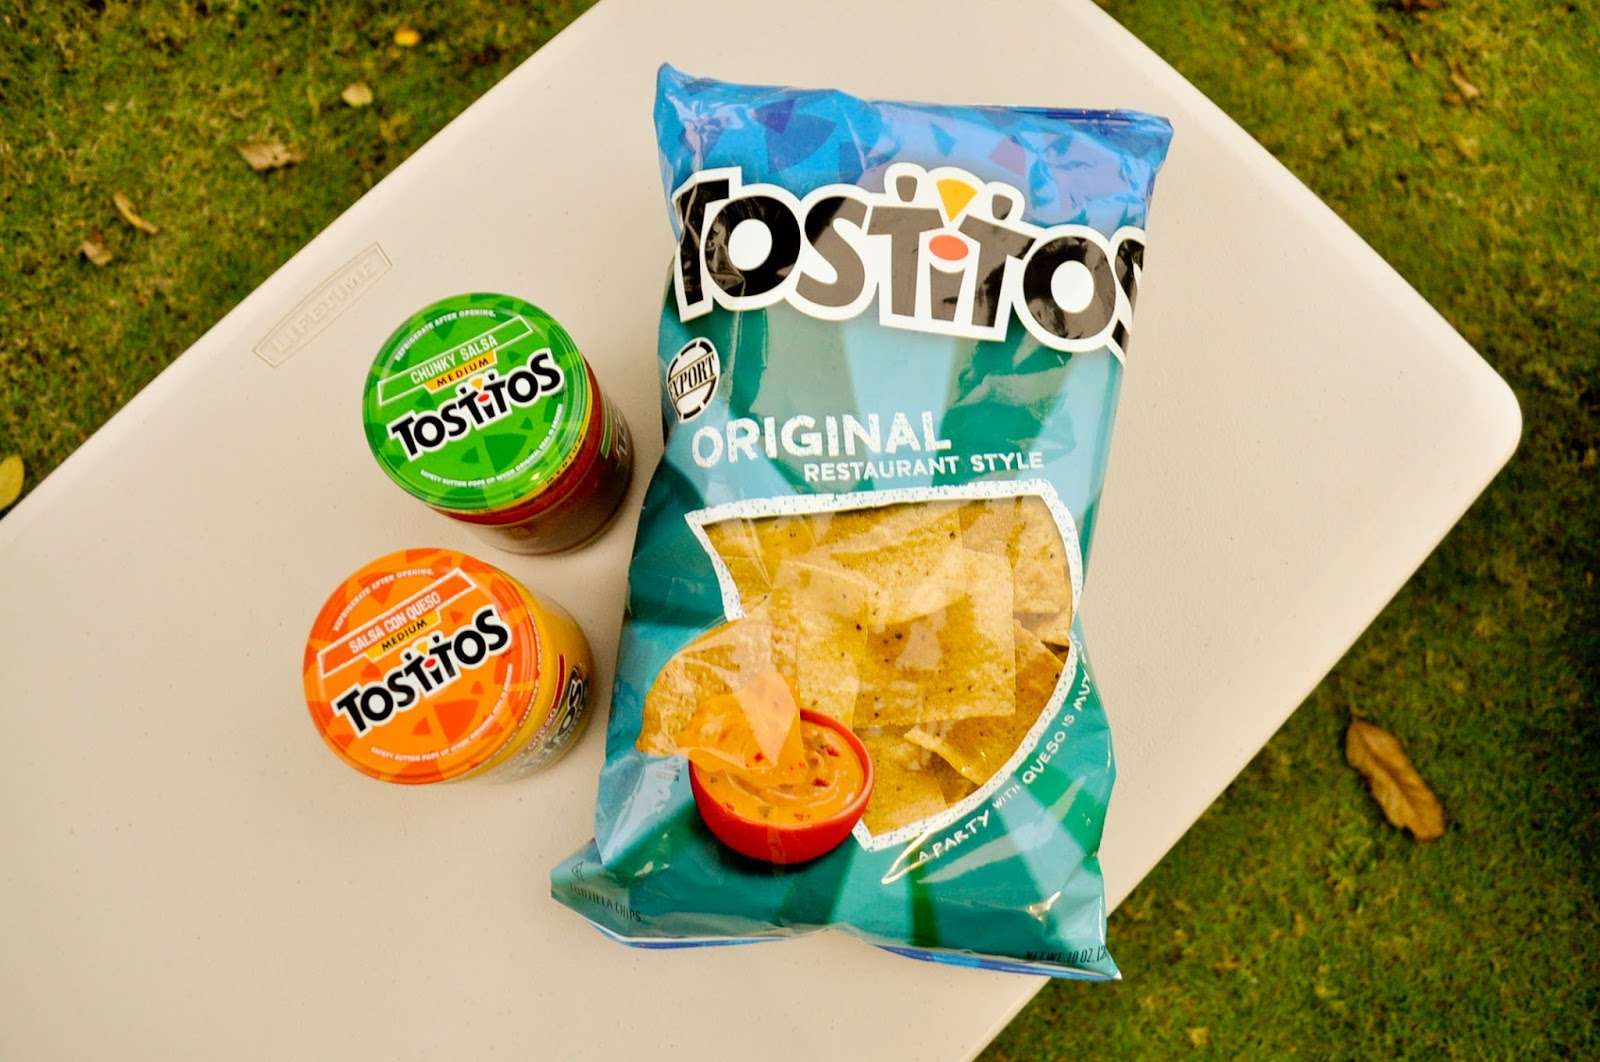 tostitos-nachos-dip-11f6b68f9603b9d272df3a93a90e8115.jpg